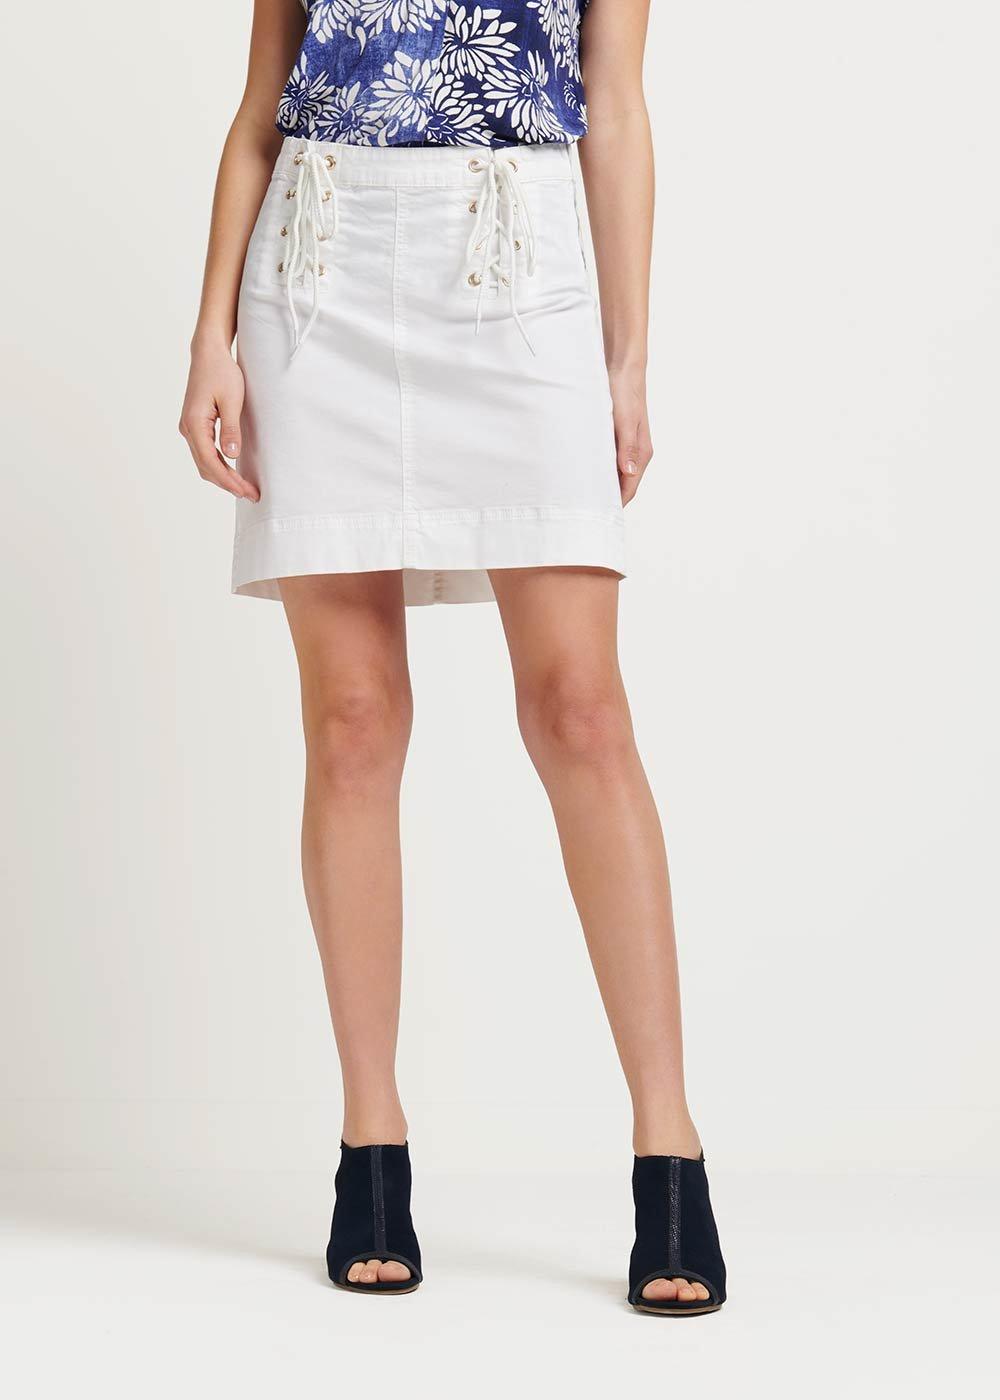 Georgie skirt with crisscross detail - White - Woman